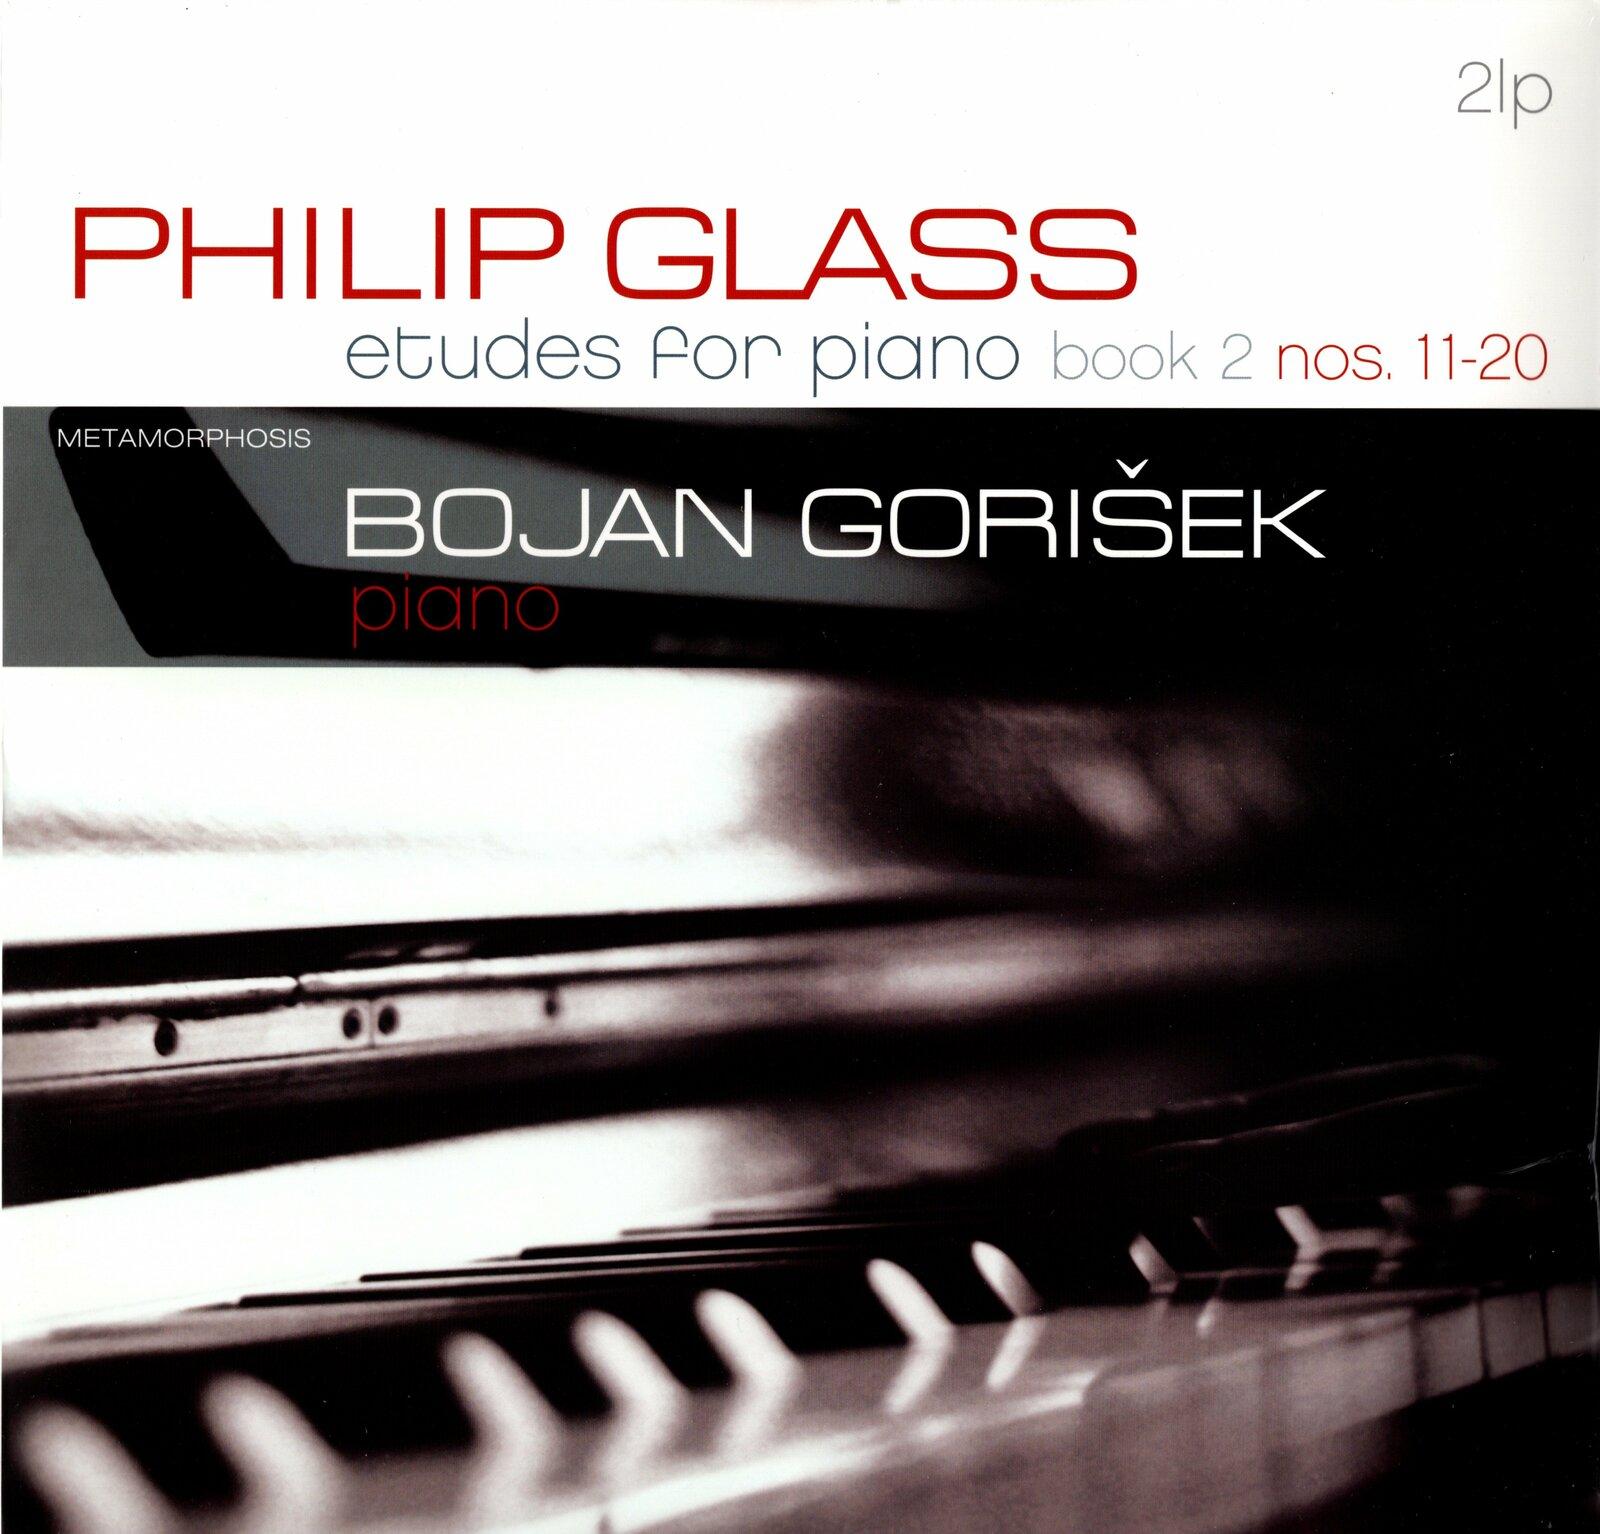 Philip Glass —Etudes for Piano Book 2 Nos. 11-20 |Vinyl 2LP